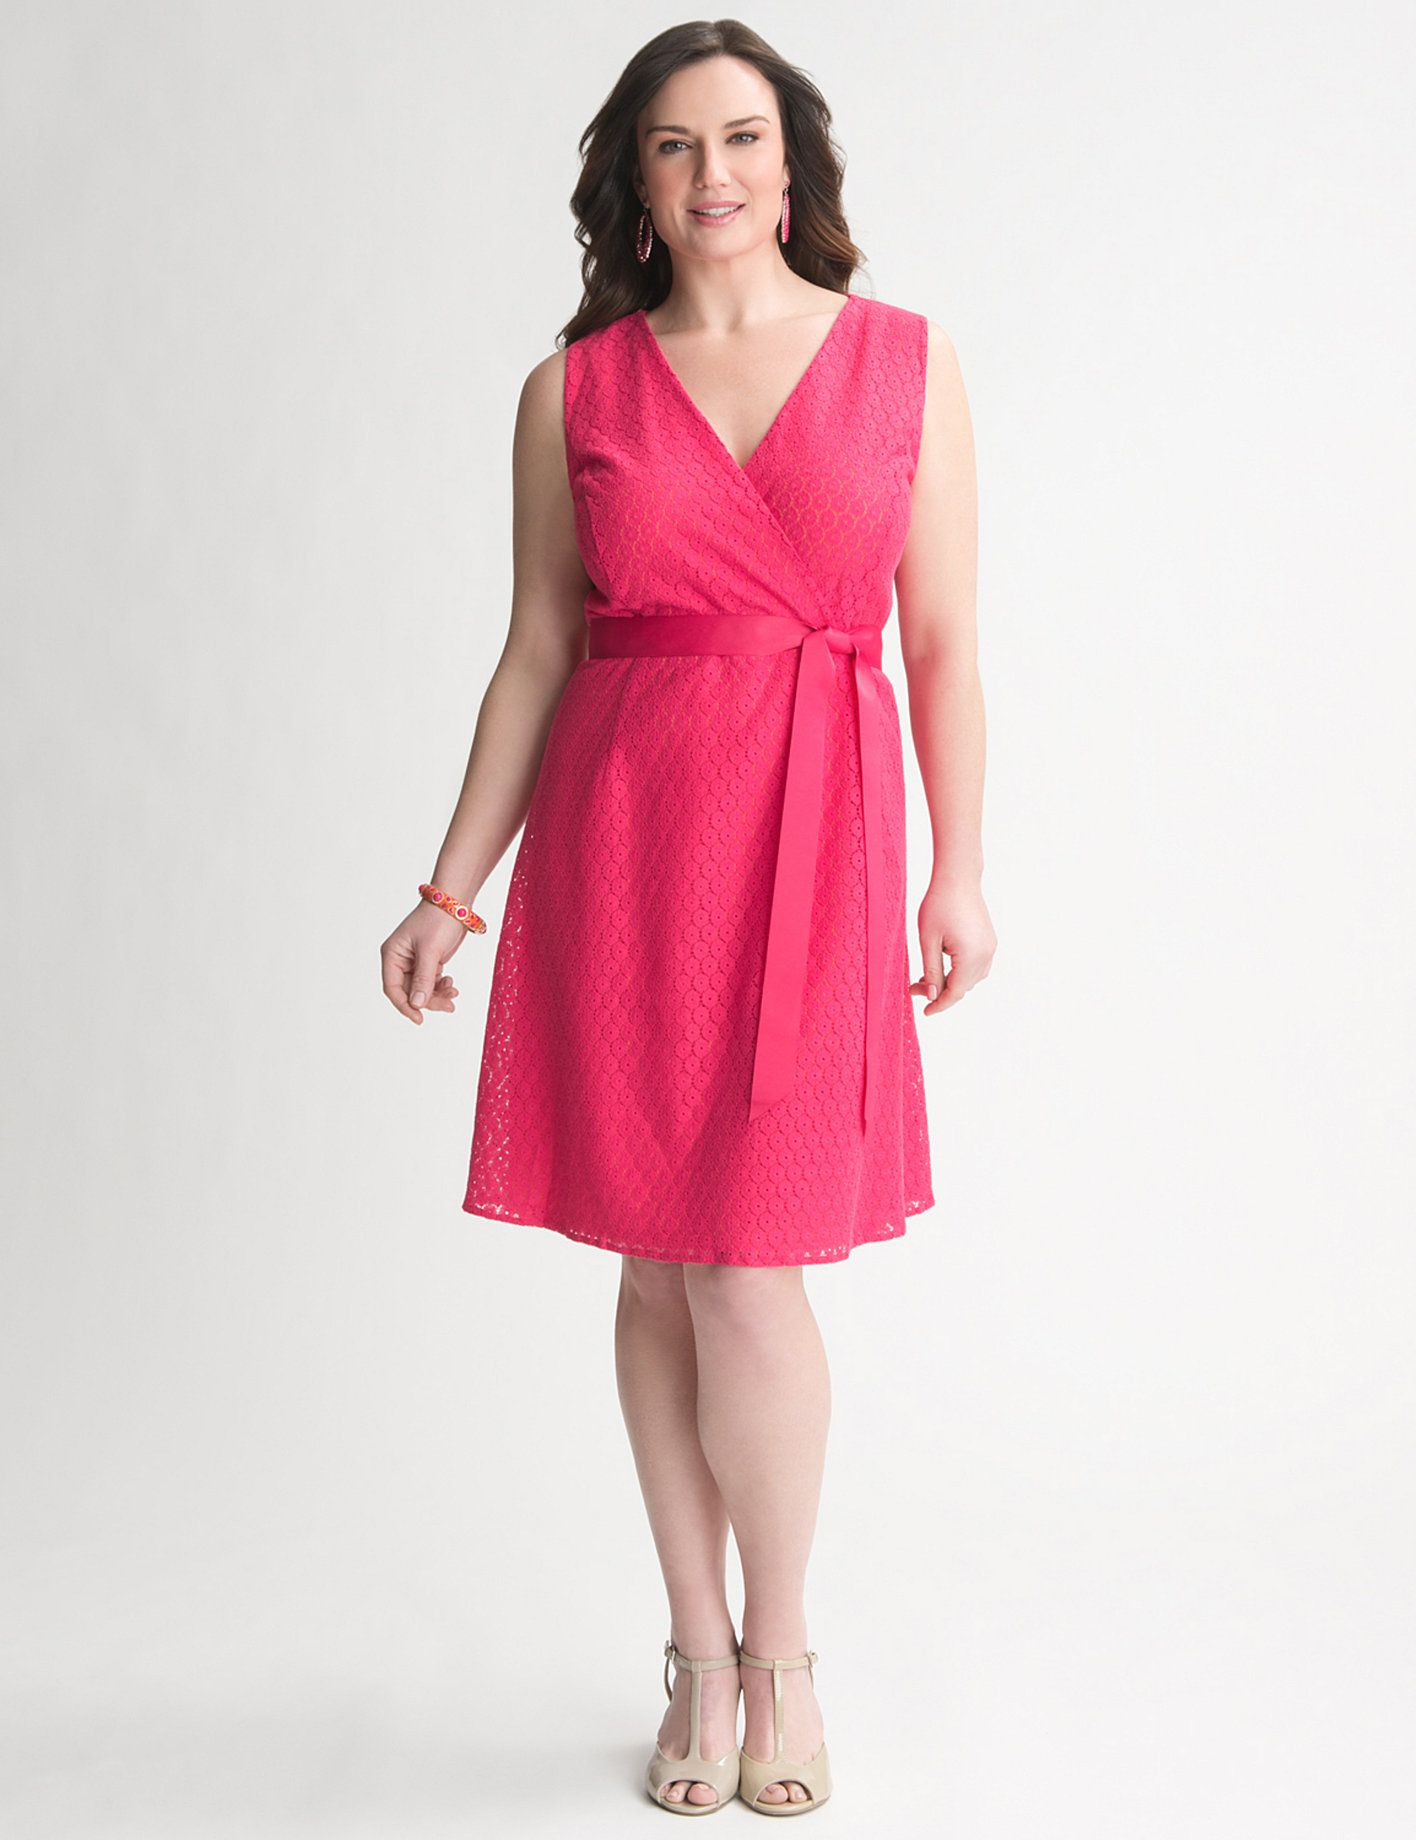 Wedding dresses department stores  Plus Size Career Dresses u Plus Size Work Dresses  Lane Bryant